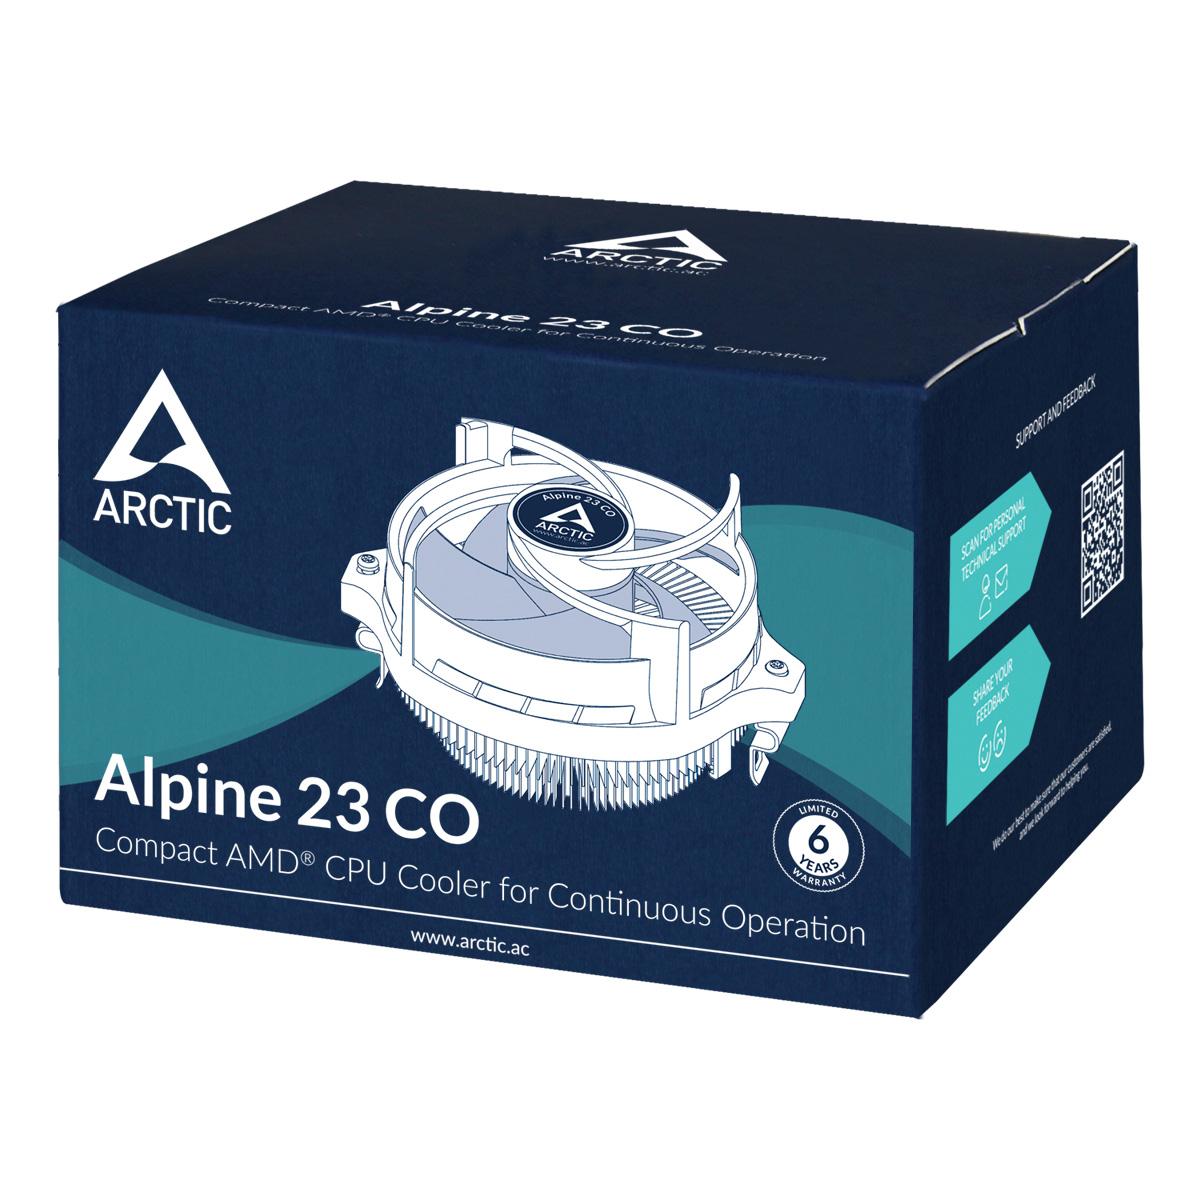 Alpine 23 CO